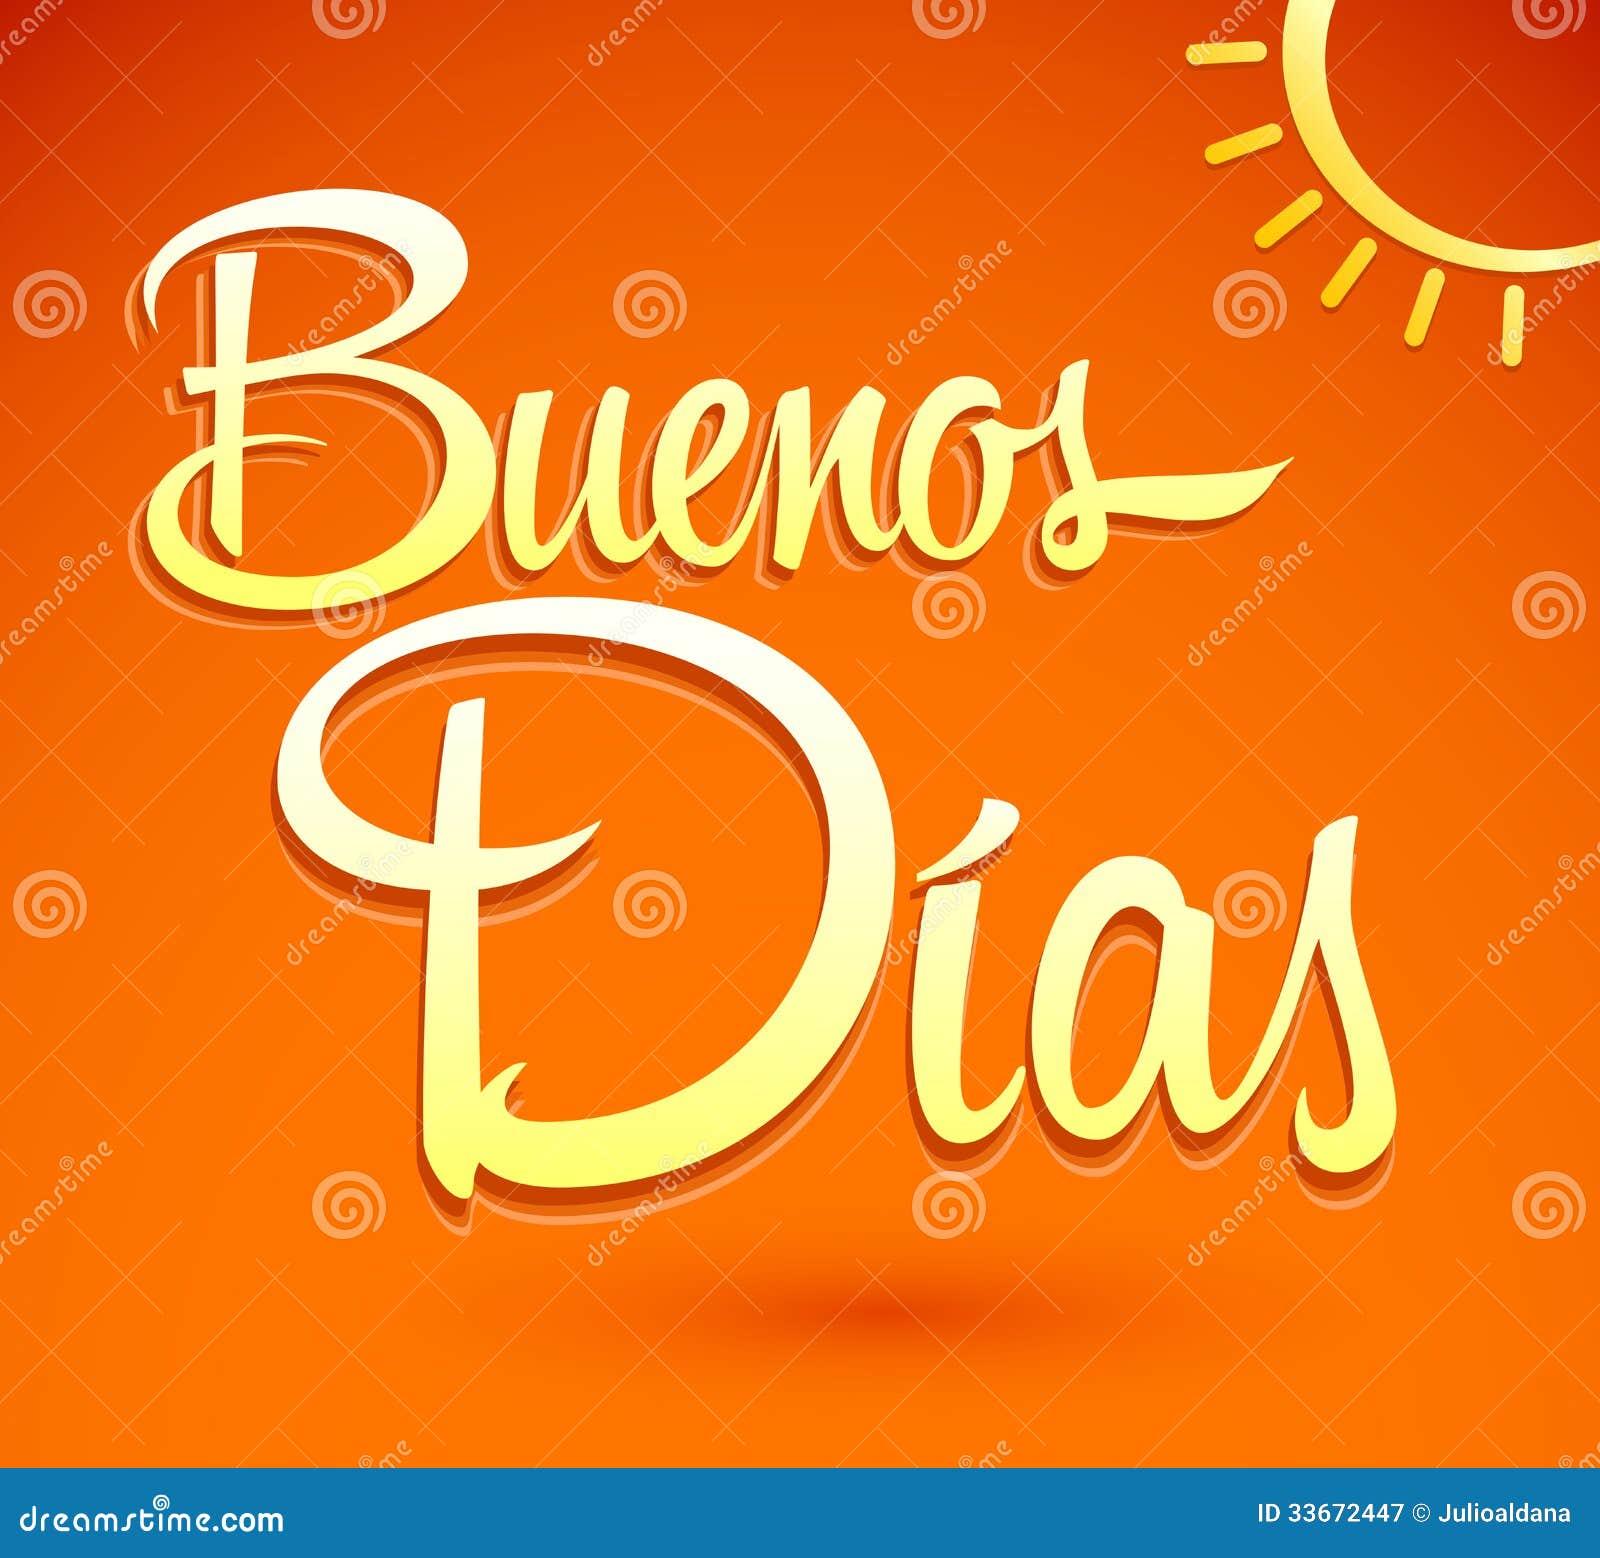 Buenos Dias Spanische Textbeschriftung Des Guten Morgens